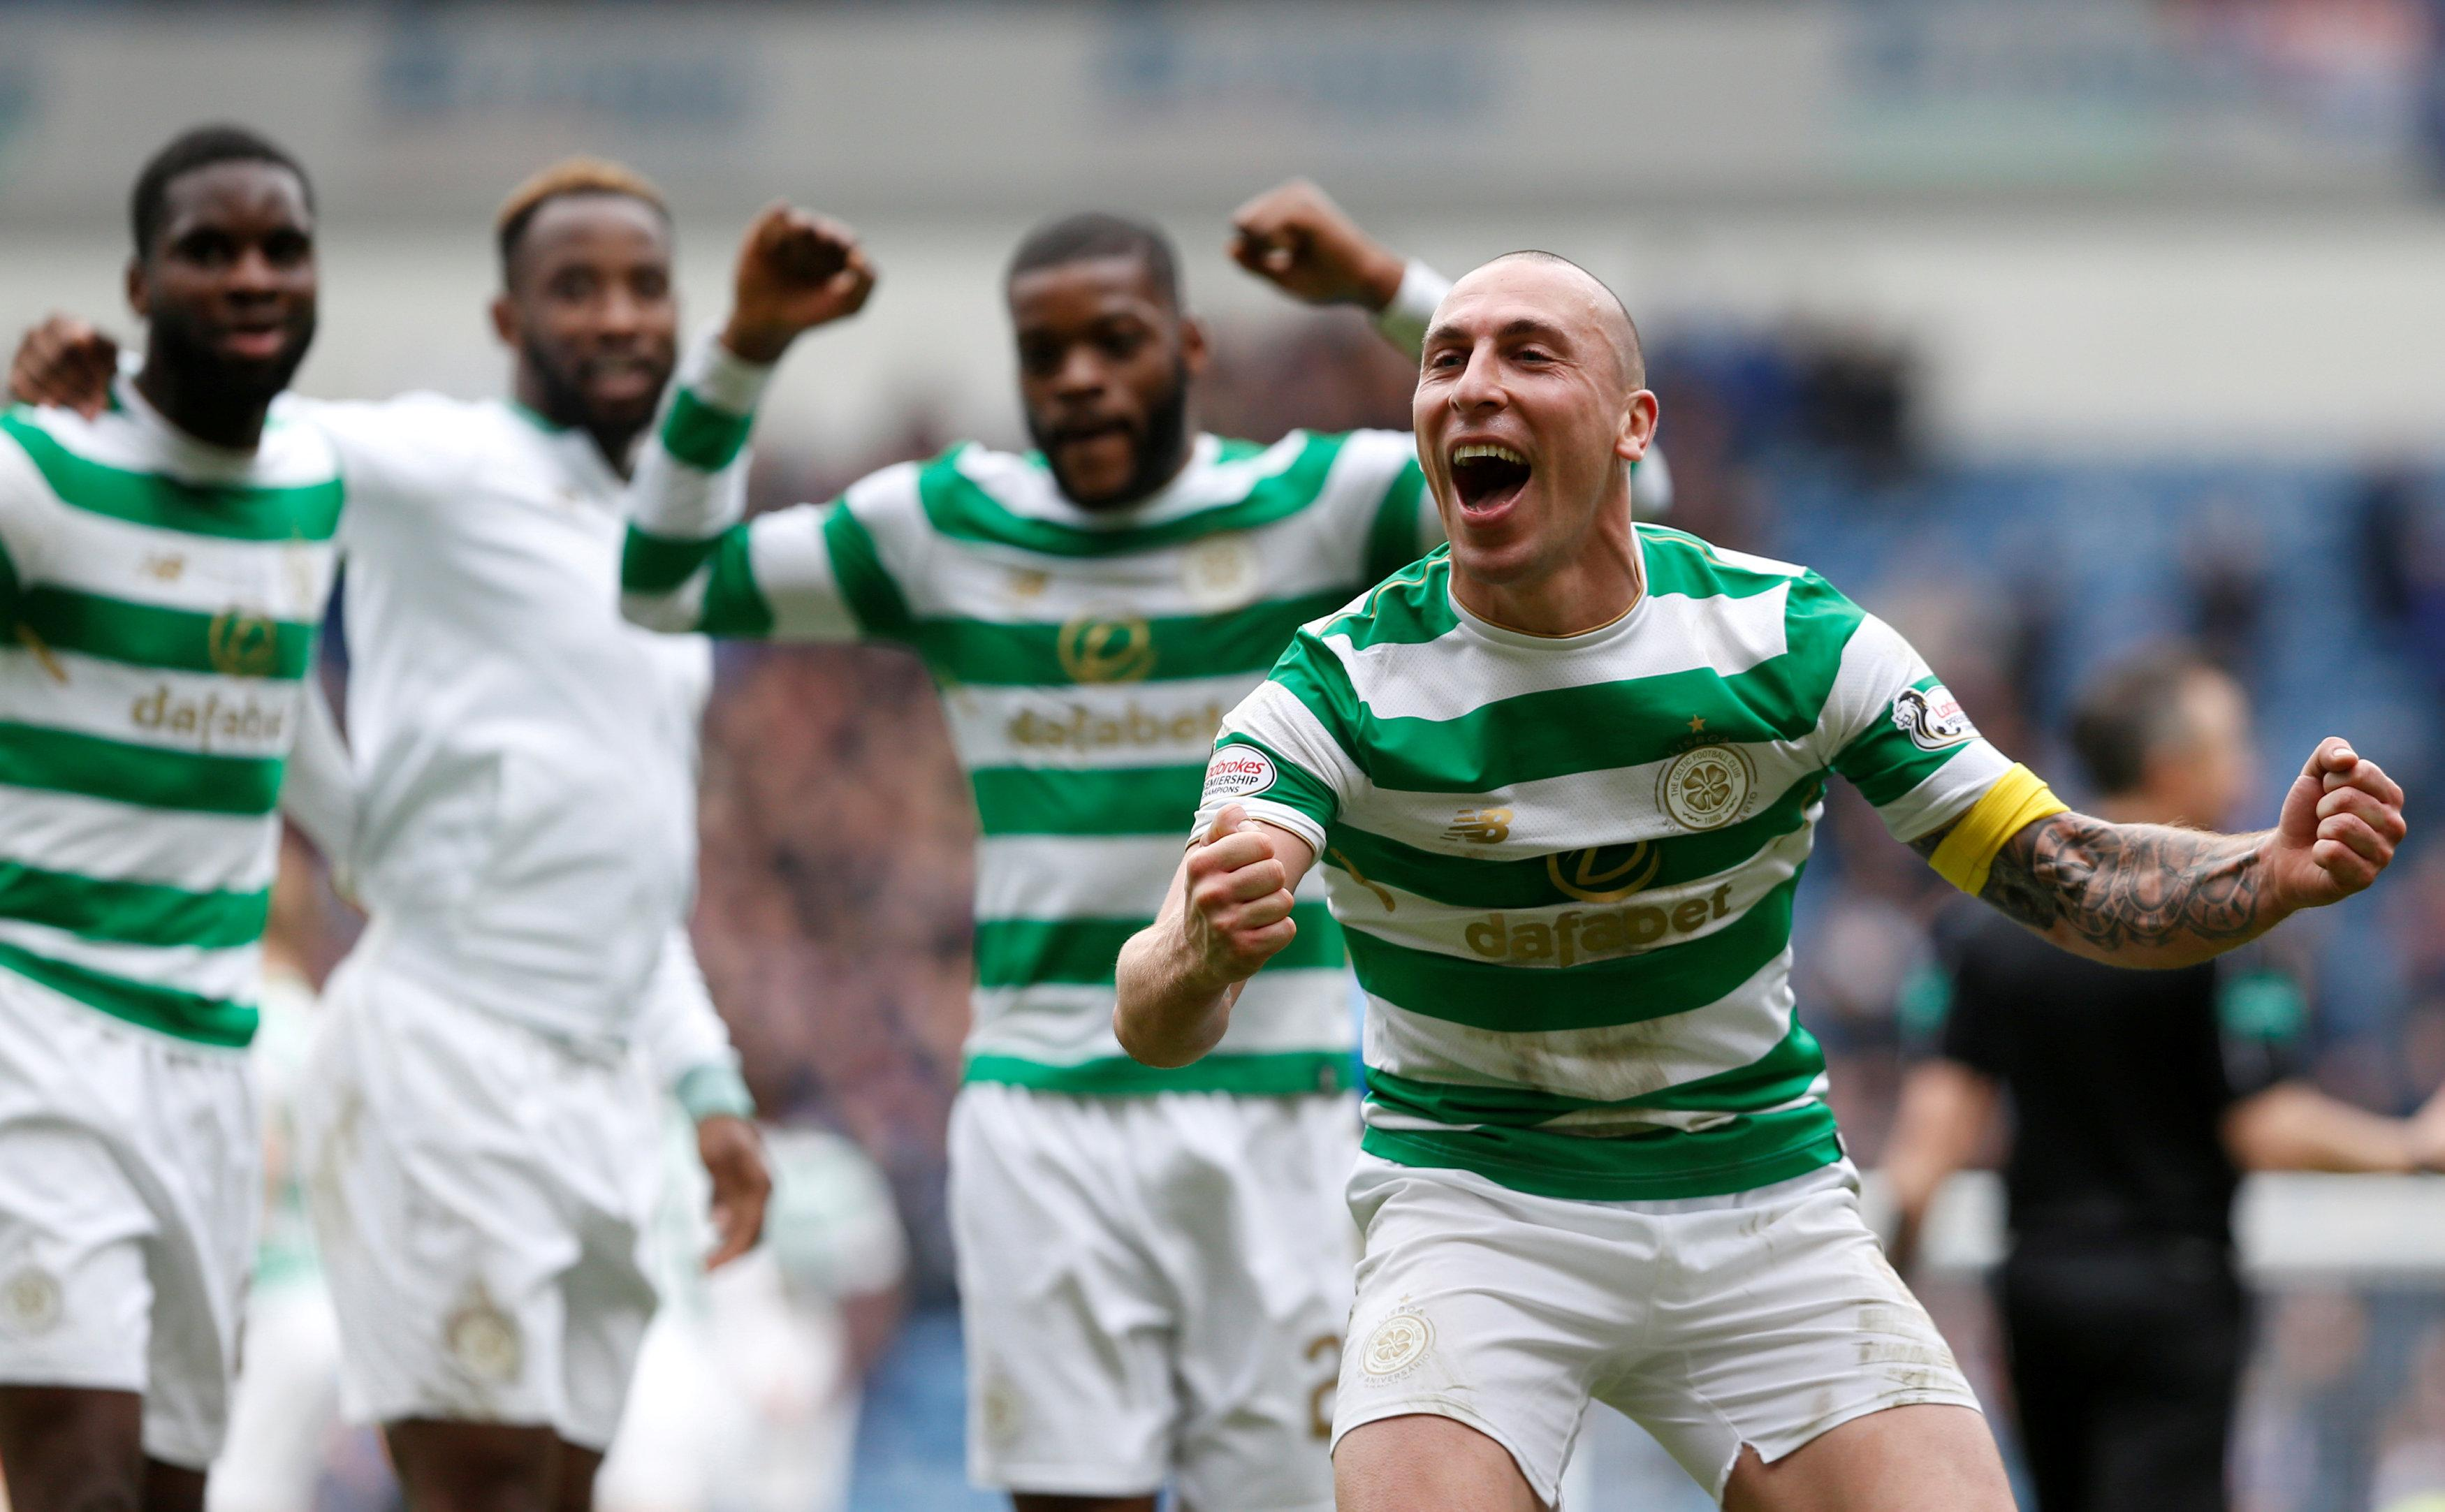 Celtic continue their pre-season with a match against Bohemians Prague